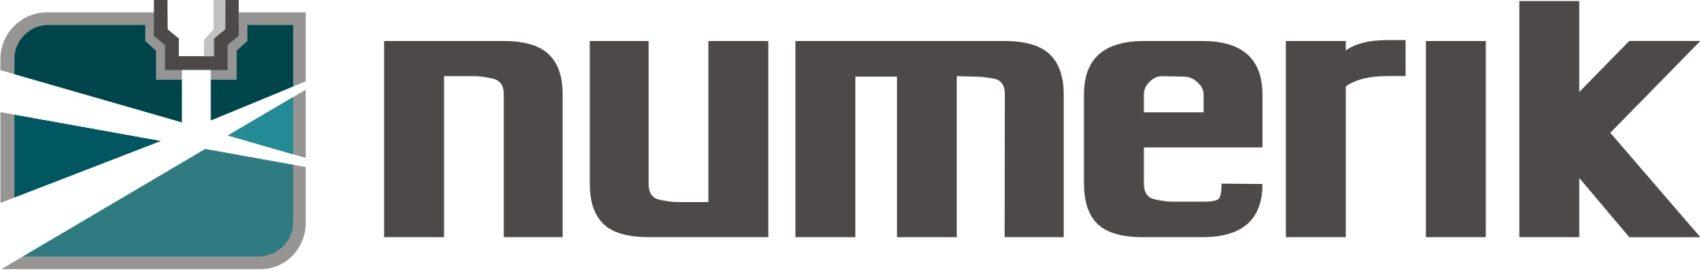 PANTOGRAFOS NUMERIK :: Pantógrafos CNC para corte por Plasma y Oxicorte - Maquinas CNC para corte Láser de Fibra- Rosario - Santa Fe - Argentina